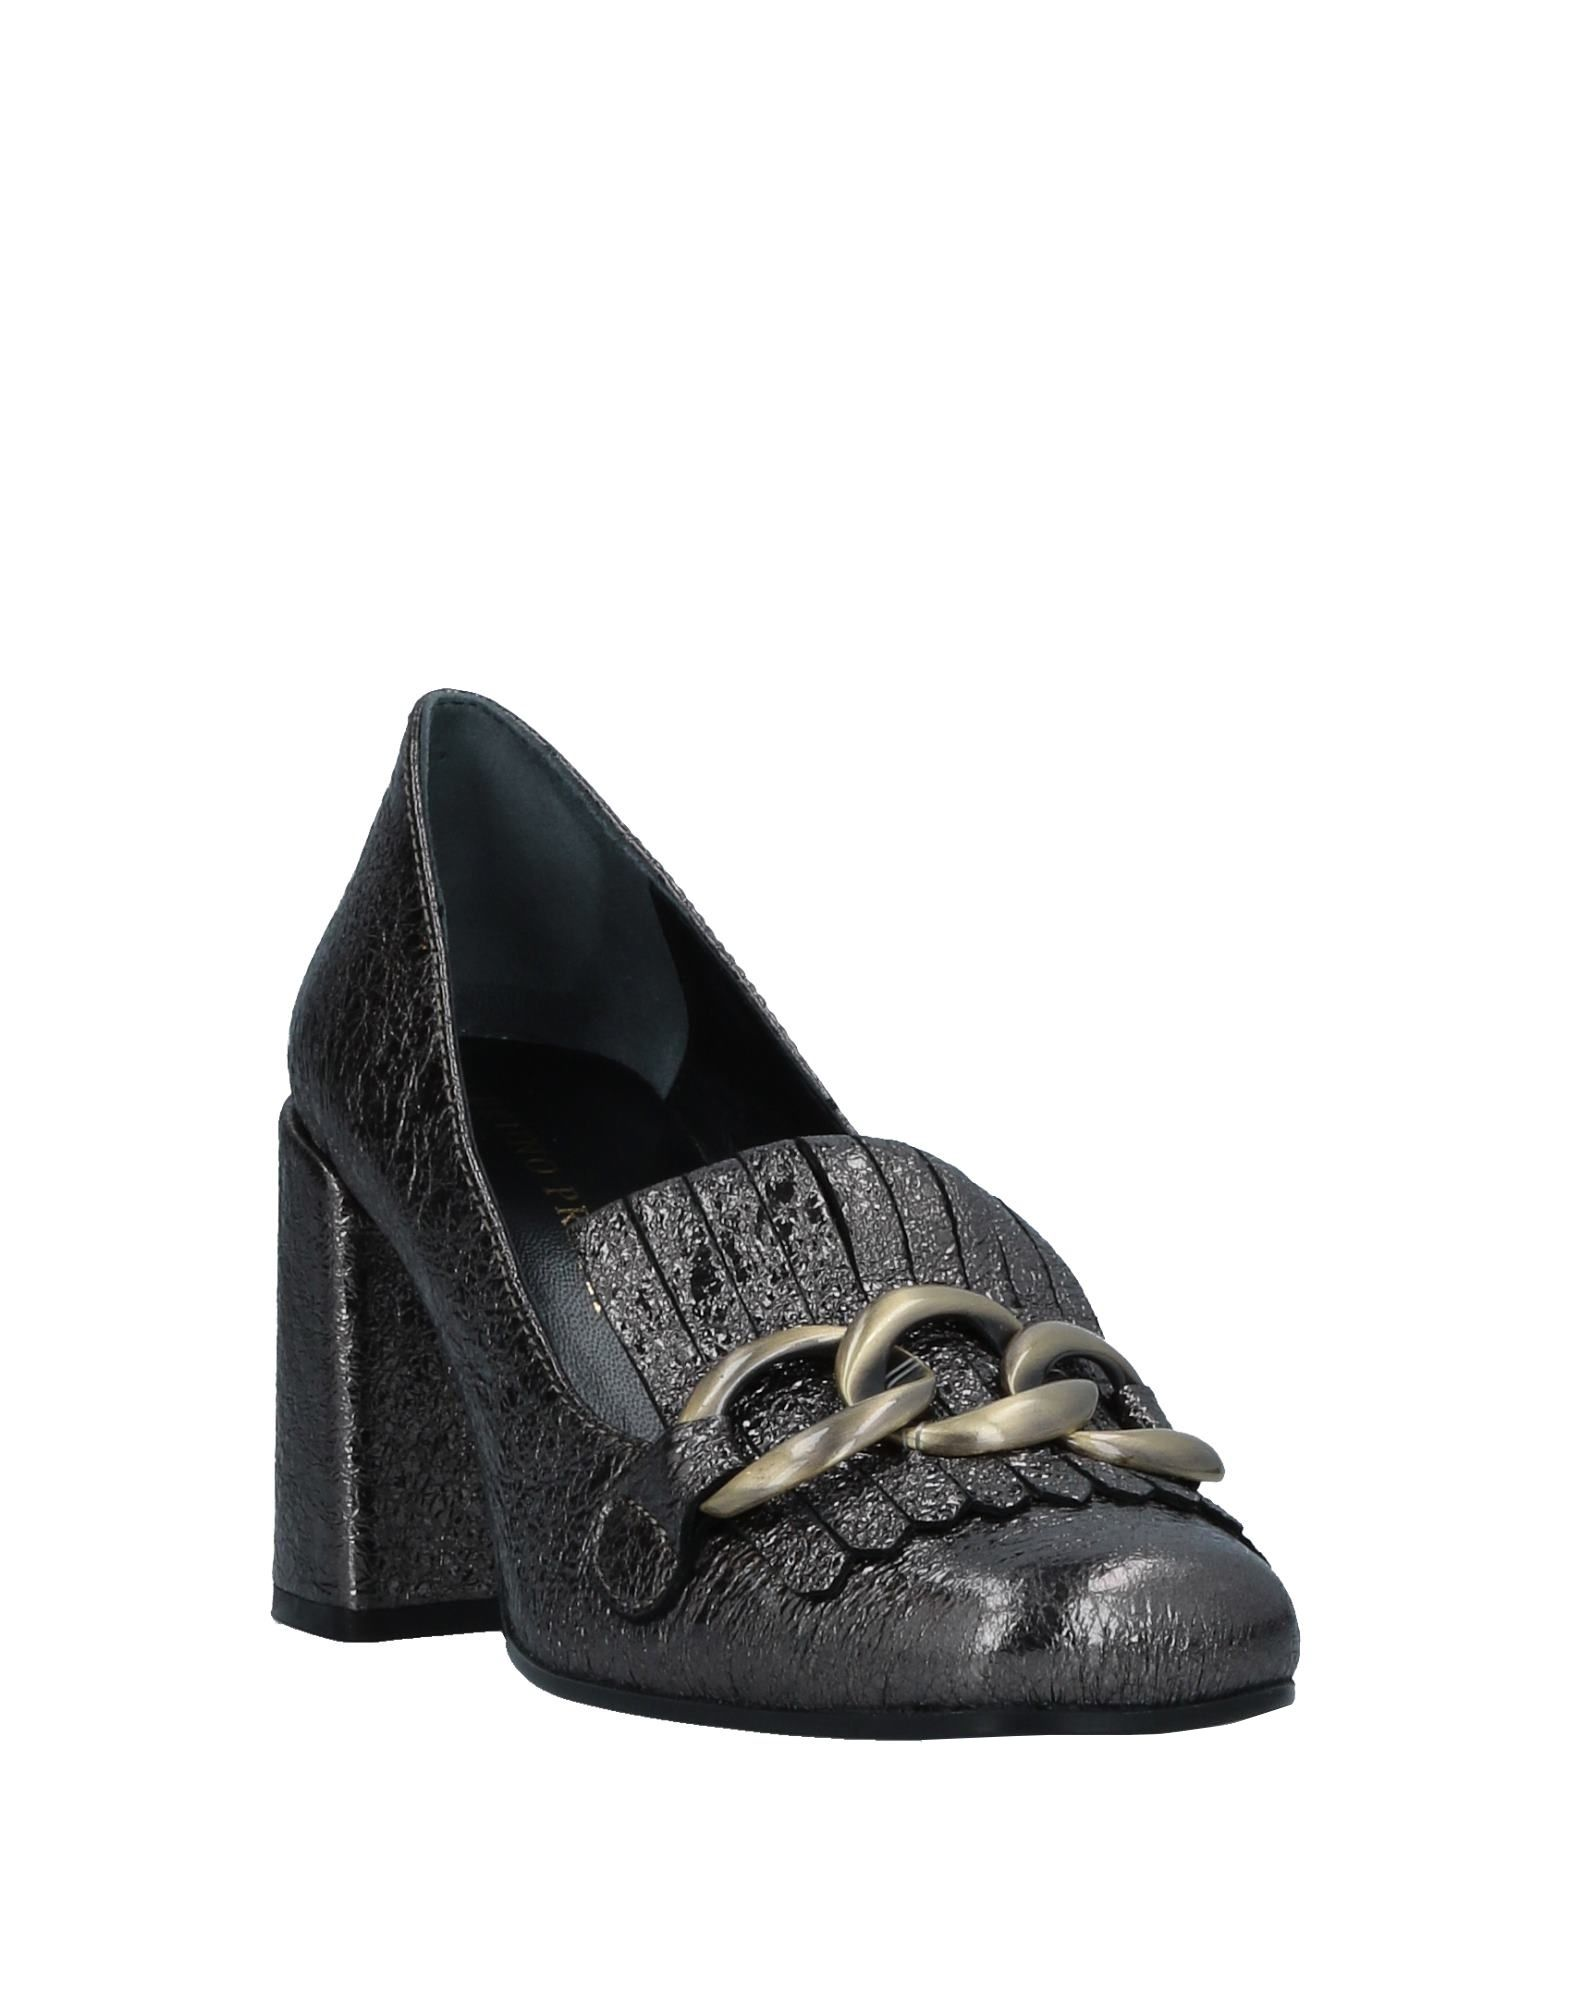 Bruno Premi Mokassins Damen   Damen 11534109FS Gute Qualität beliebte Schuhe 161a5c